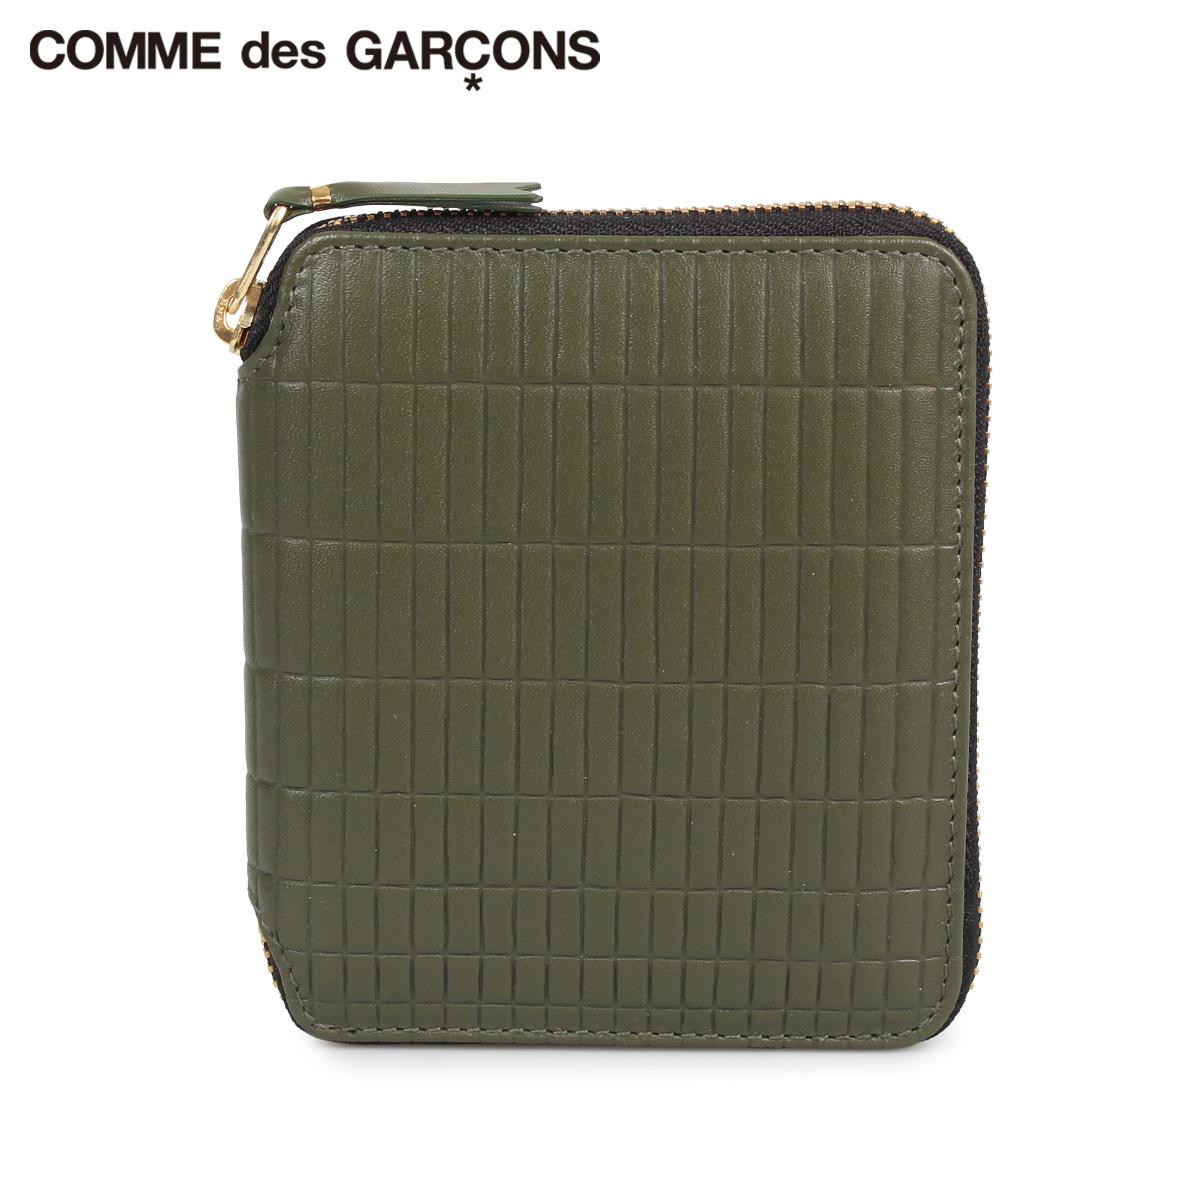 COMME des GARCONS コムデギャルソン 財布 二つ折り メンズ レディース BRICK WALLET カーキ SA2100BK